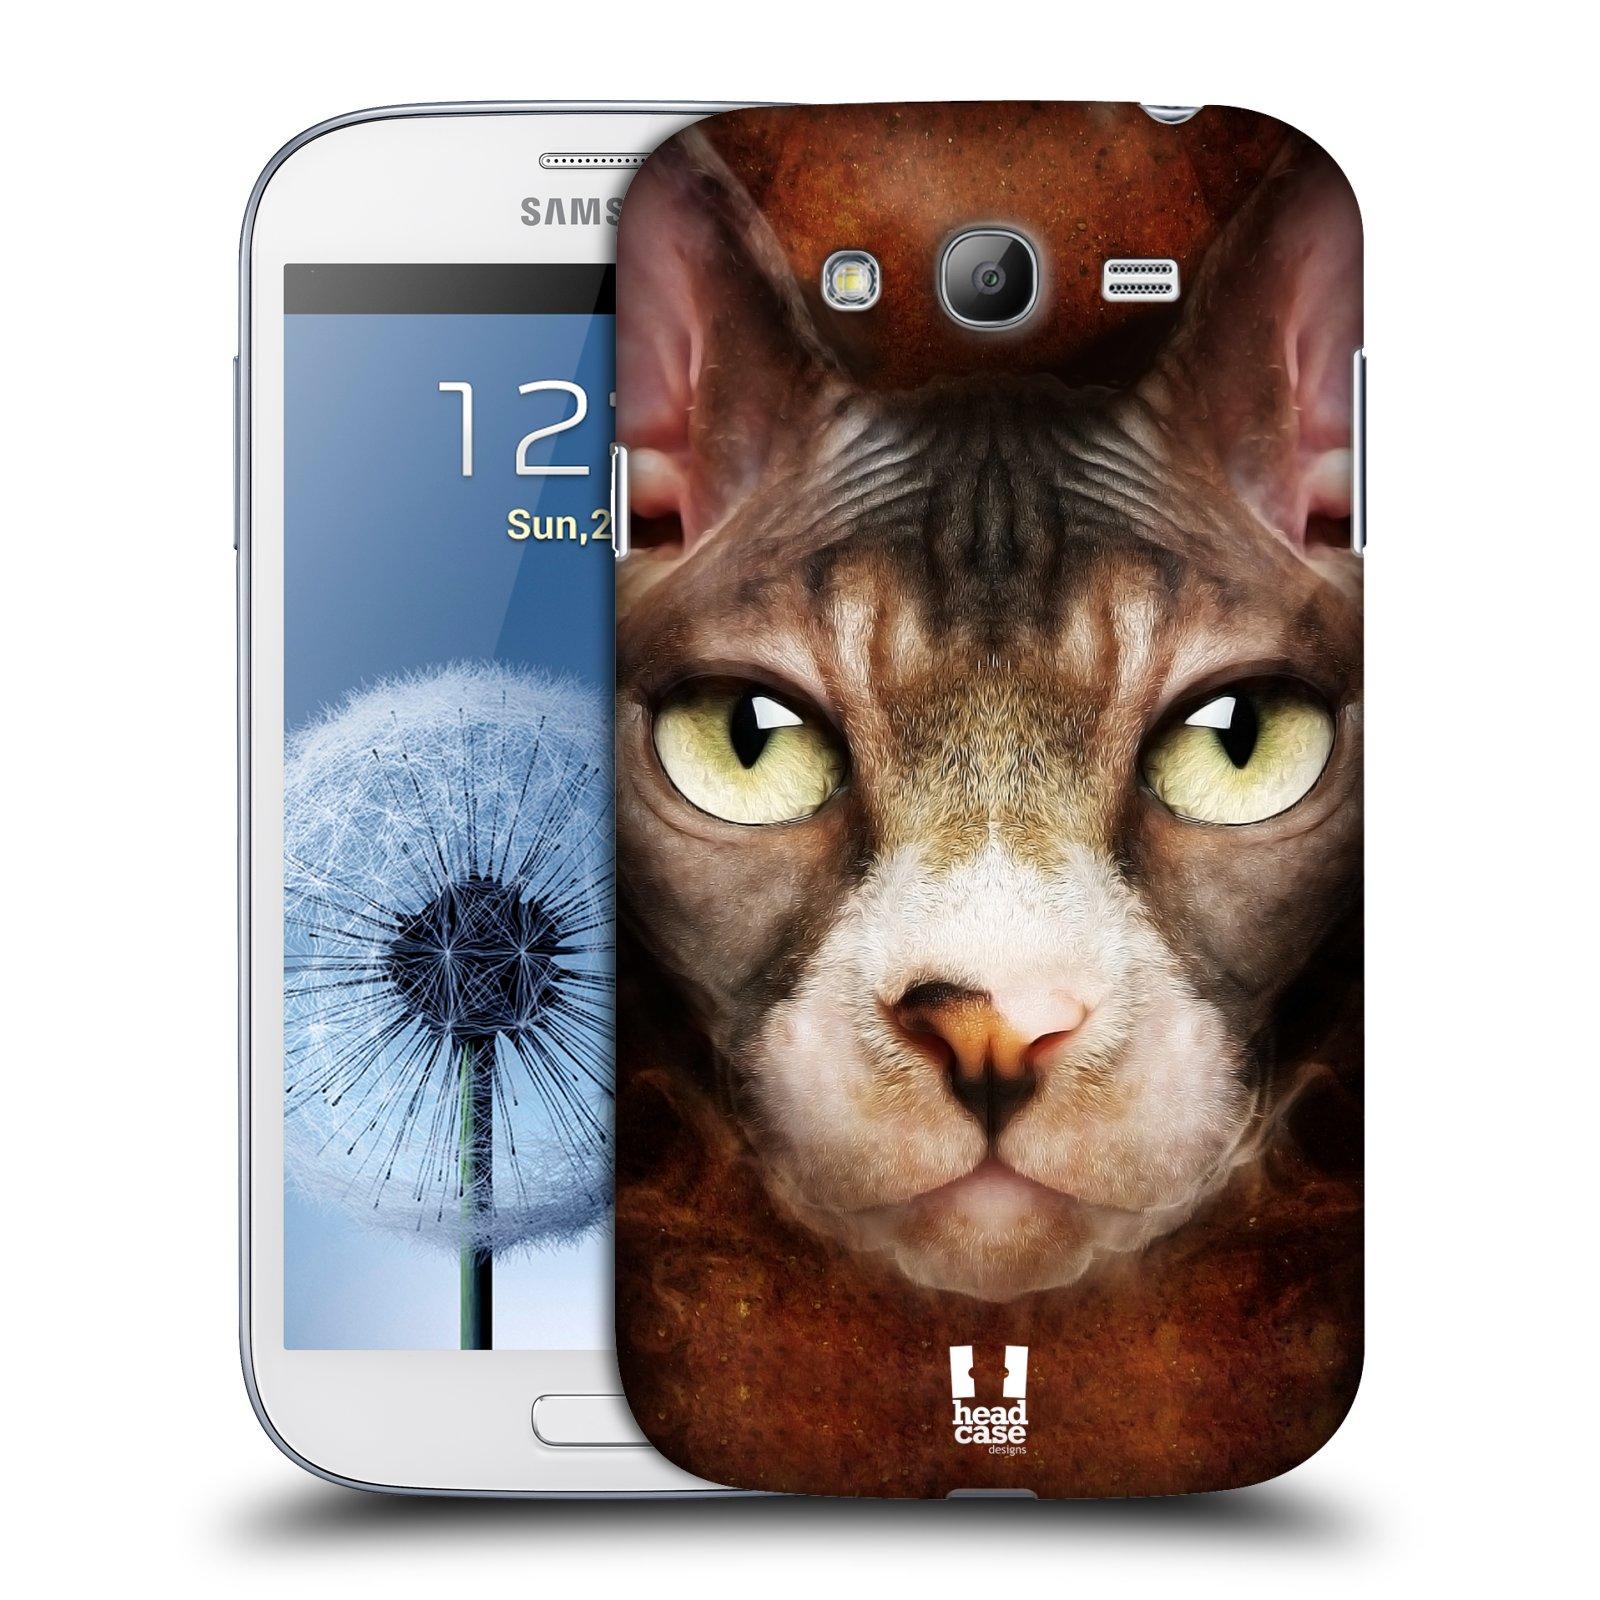 HEAD CASE plastový obal na mobil SAMSUNG GALAXY Grand i9080 vzor Zvířecí tváře kočka sphynx